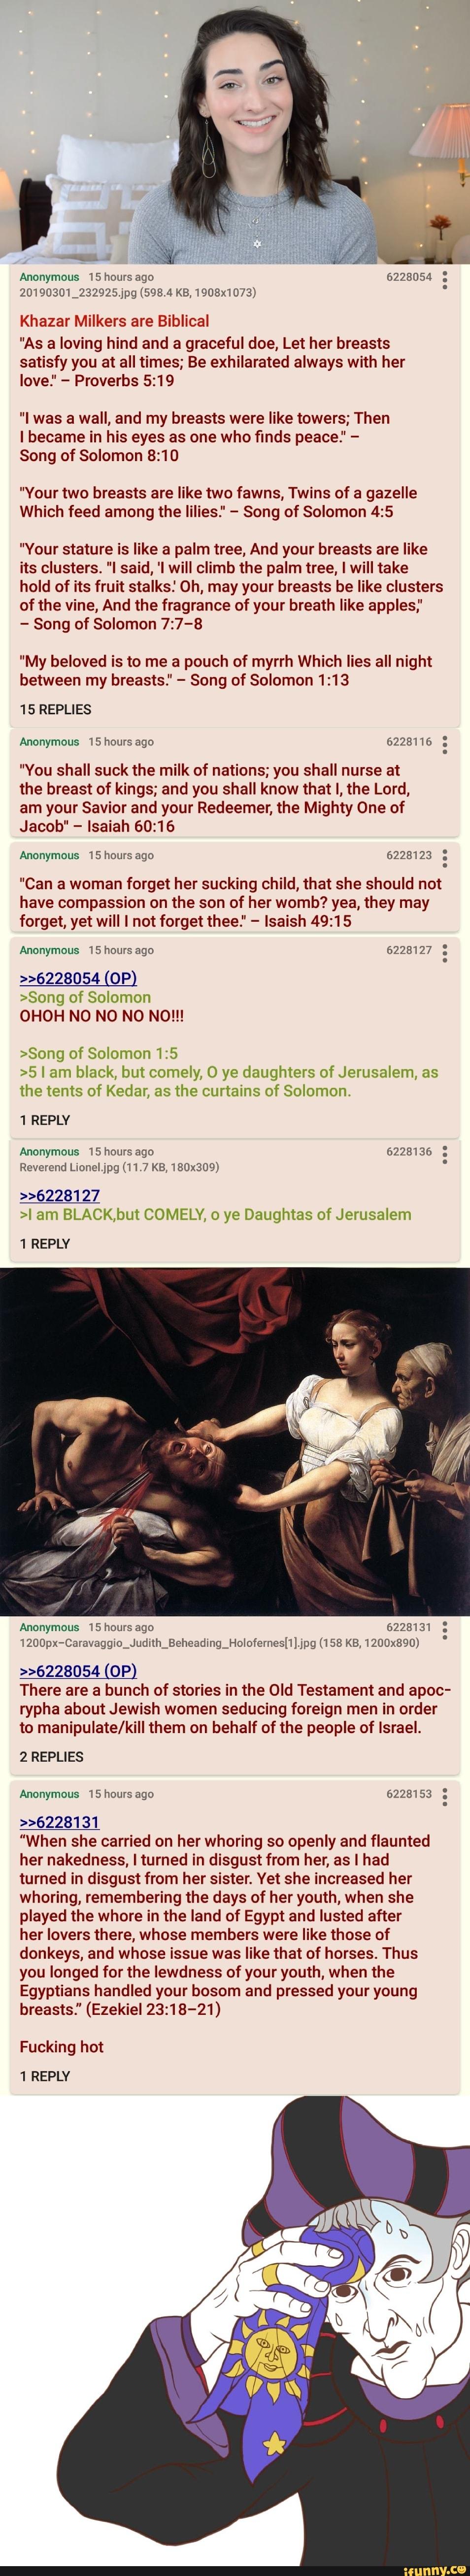 Khazar Milkers are Biblical